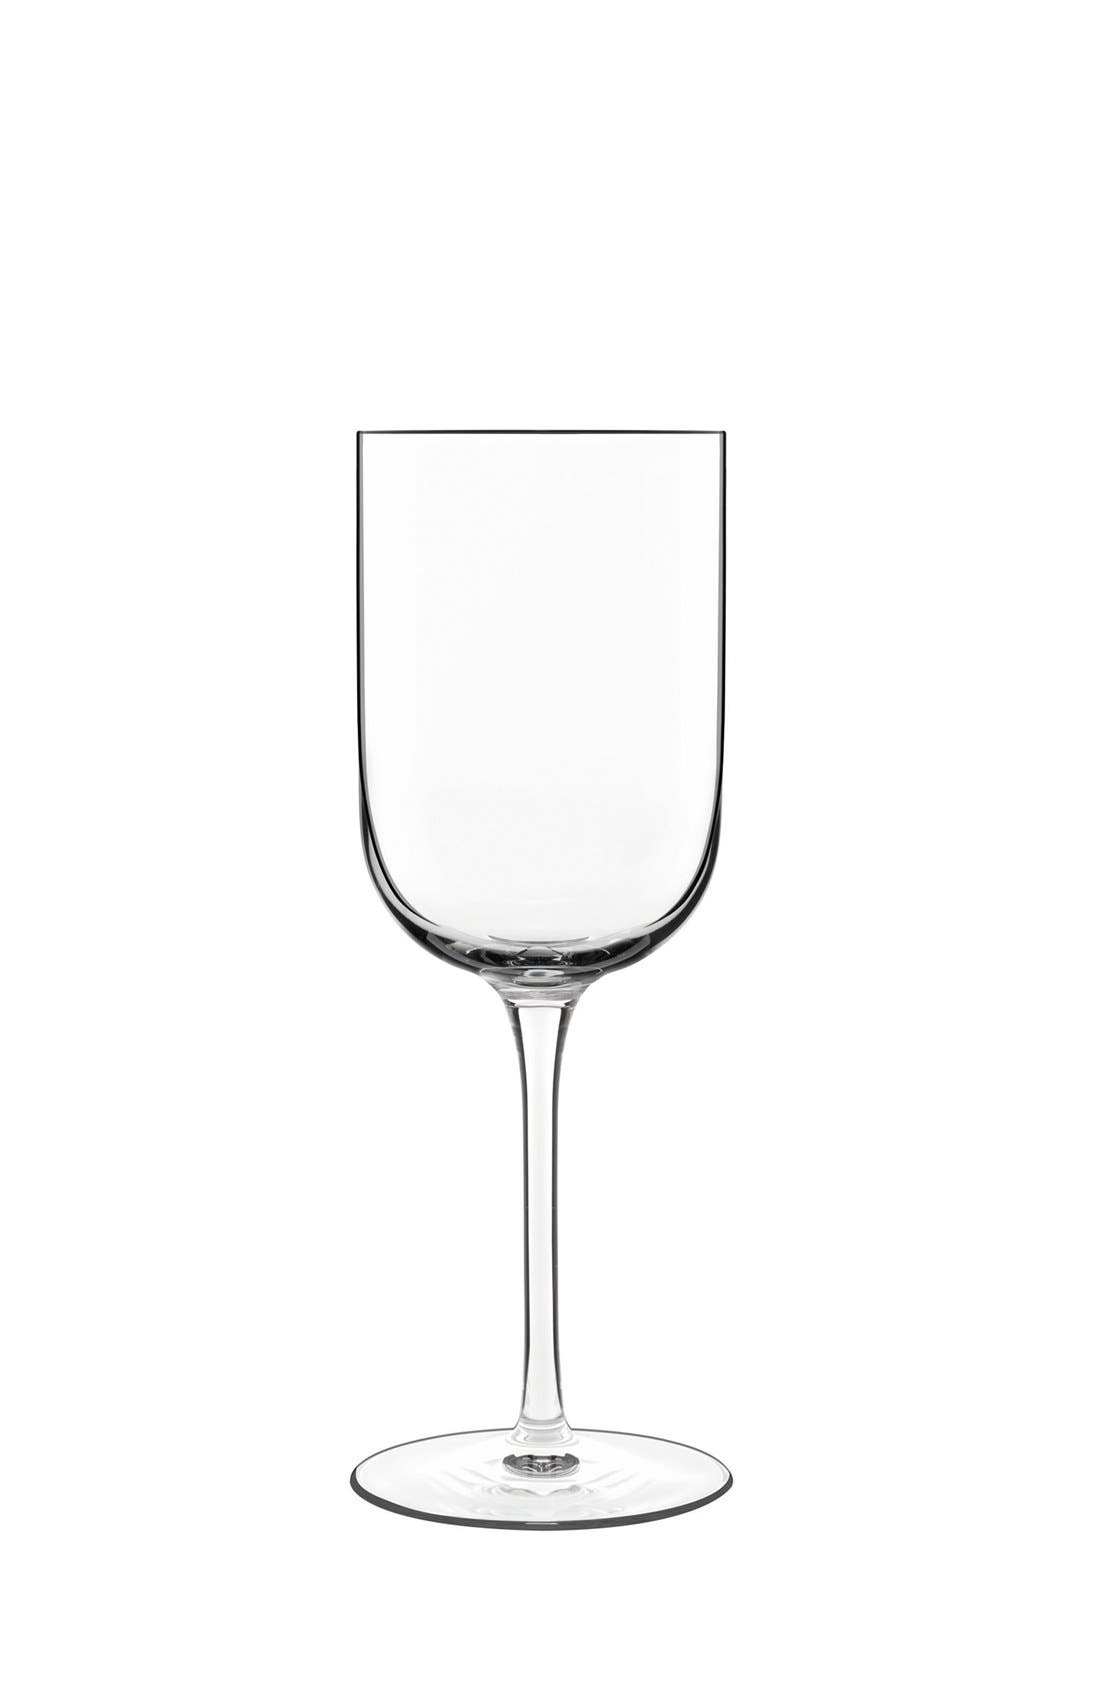 Main Image - Luigi Bormioli 'Sublime' Red Wine Glasses (Set of 4)